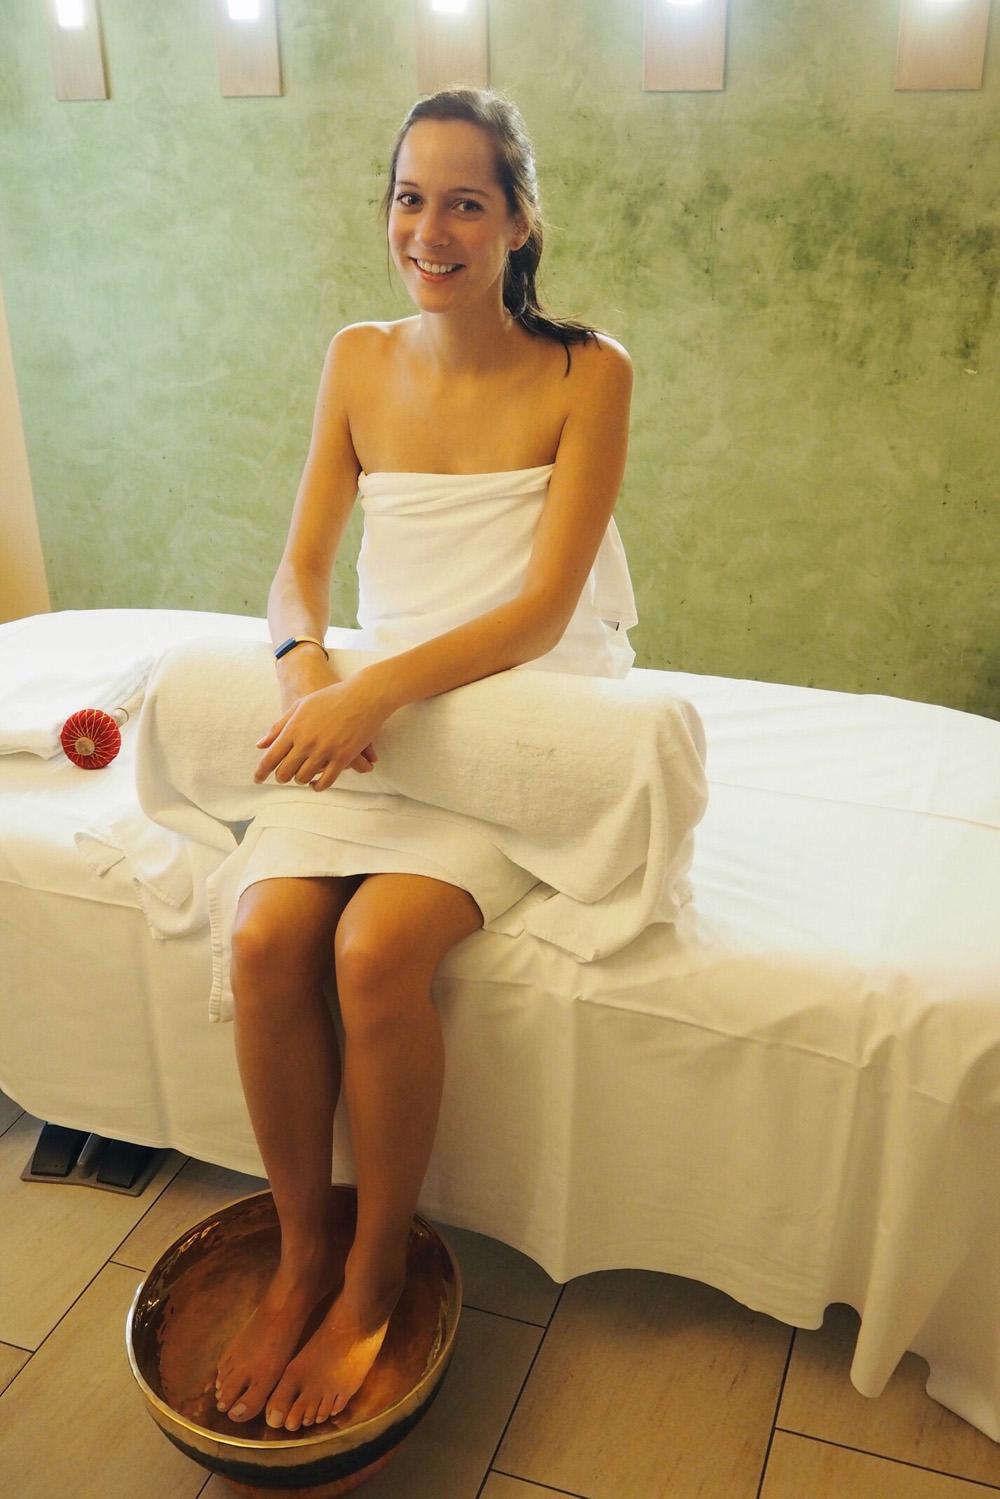 Weekend-Getaway-Hotel-Paradiso-EurothermenResort-Bad-Schallerbach-Suechtig-nach-Lifestyleblog-Fashionblog-Foodblog-Oberoesterreich-Linz-30